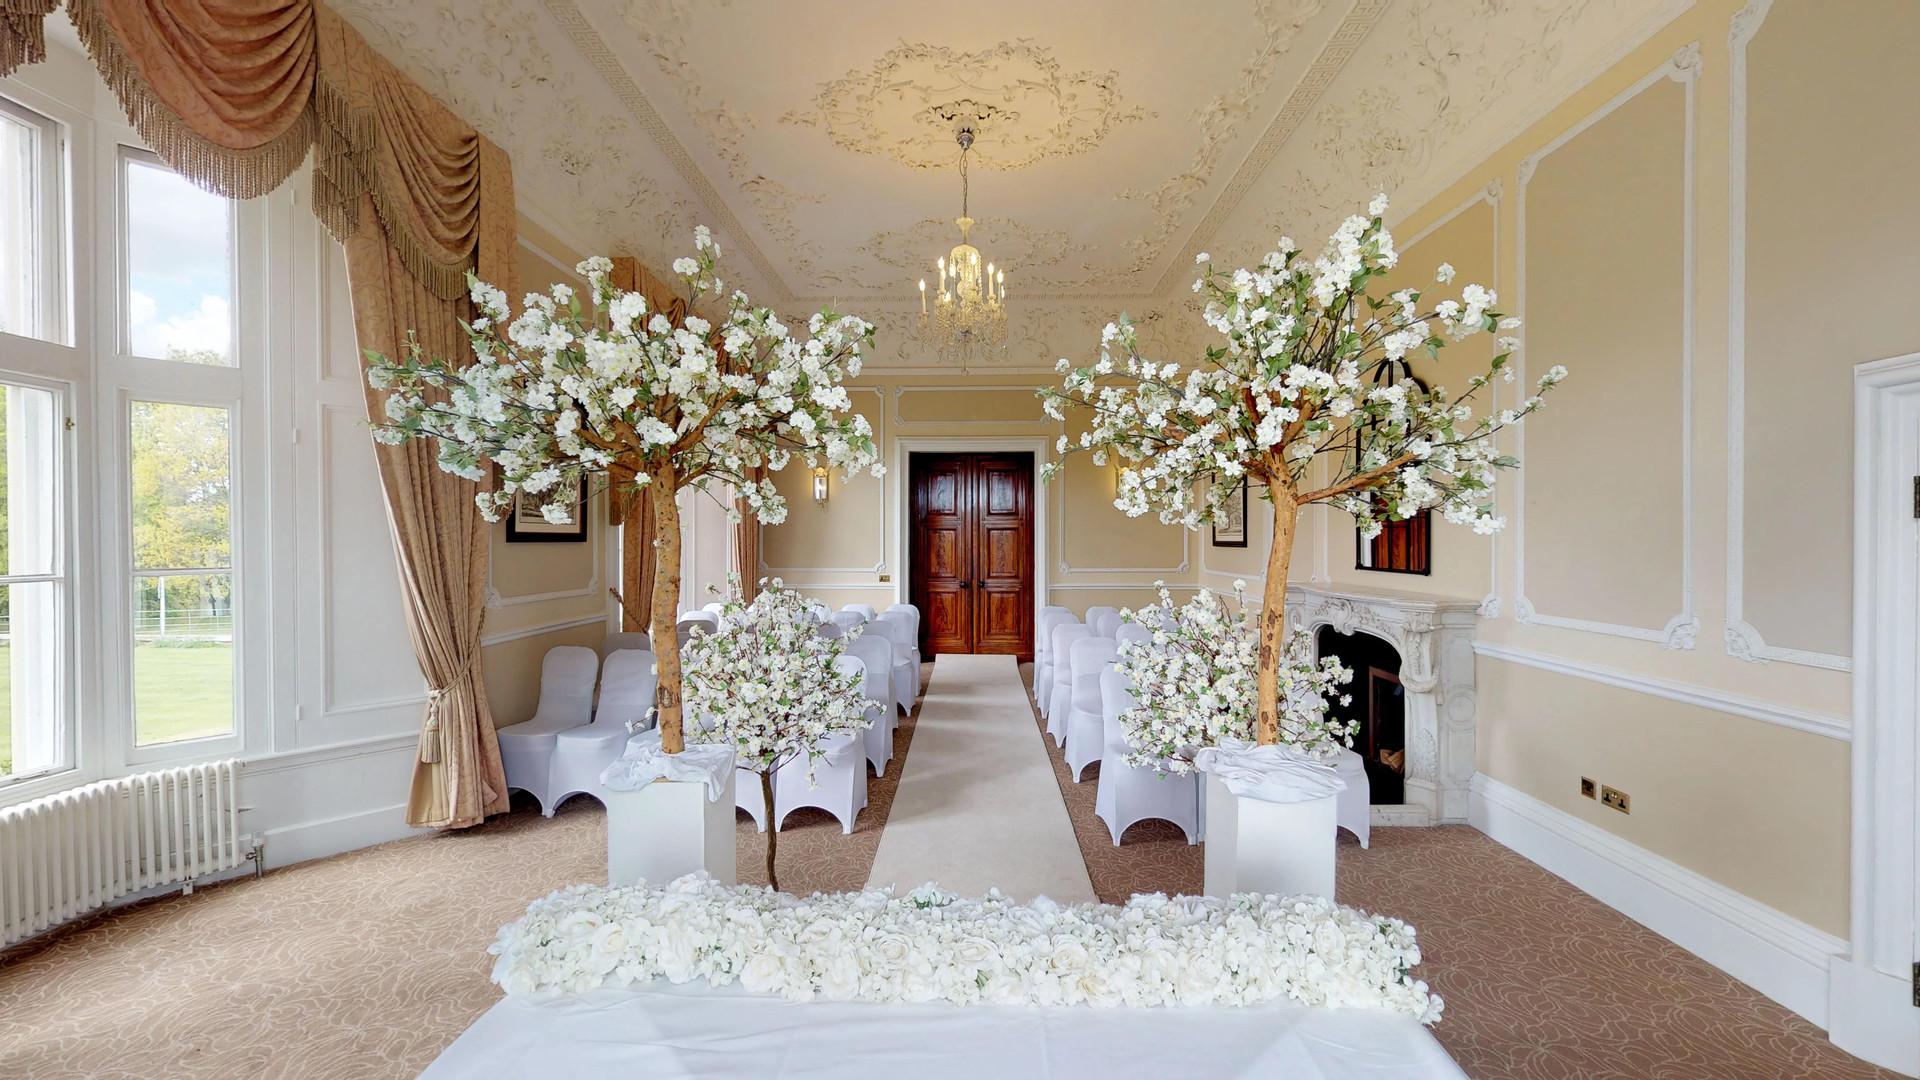 Wivenhoe-House-Hotel-Ceremony-05152019_1